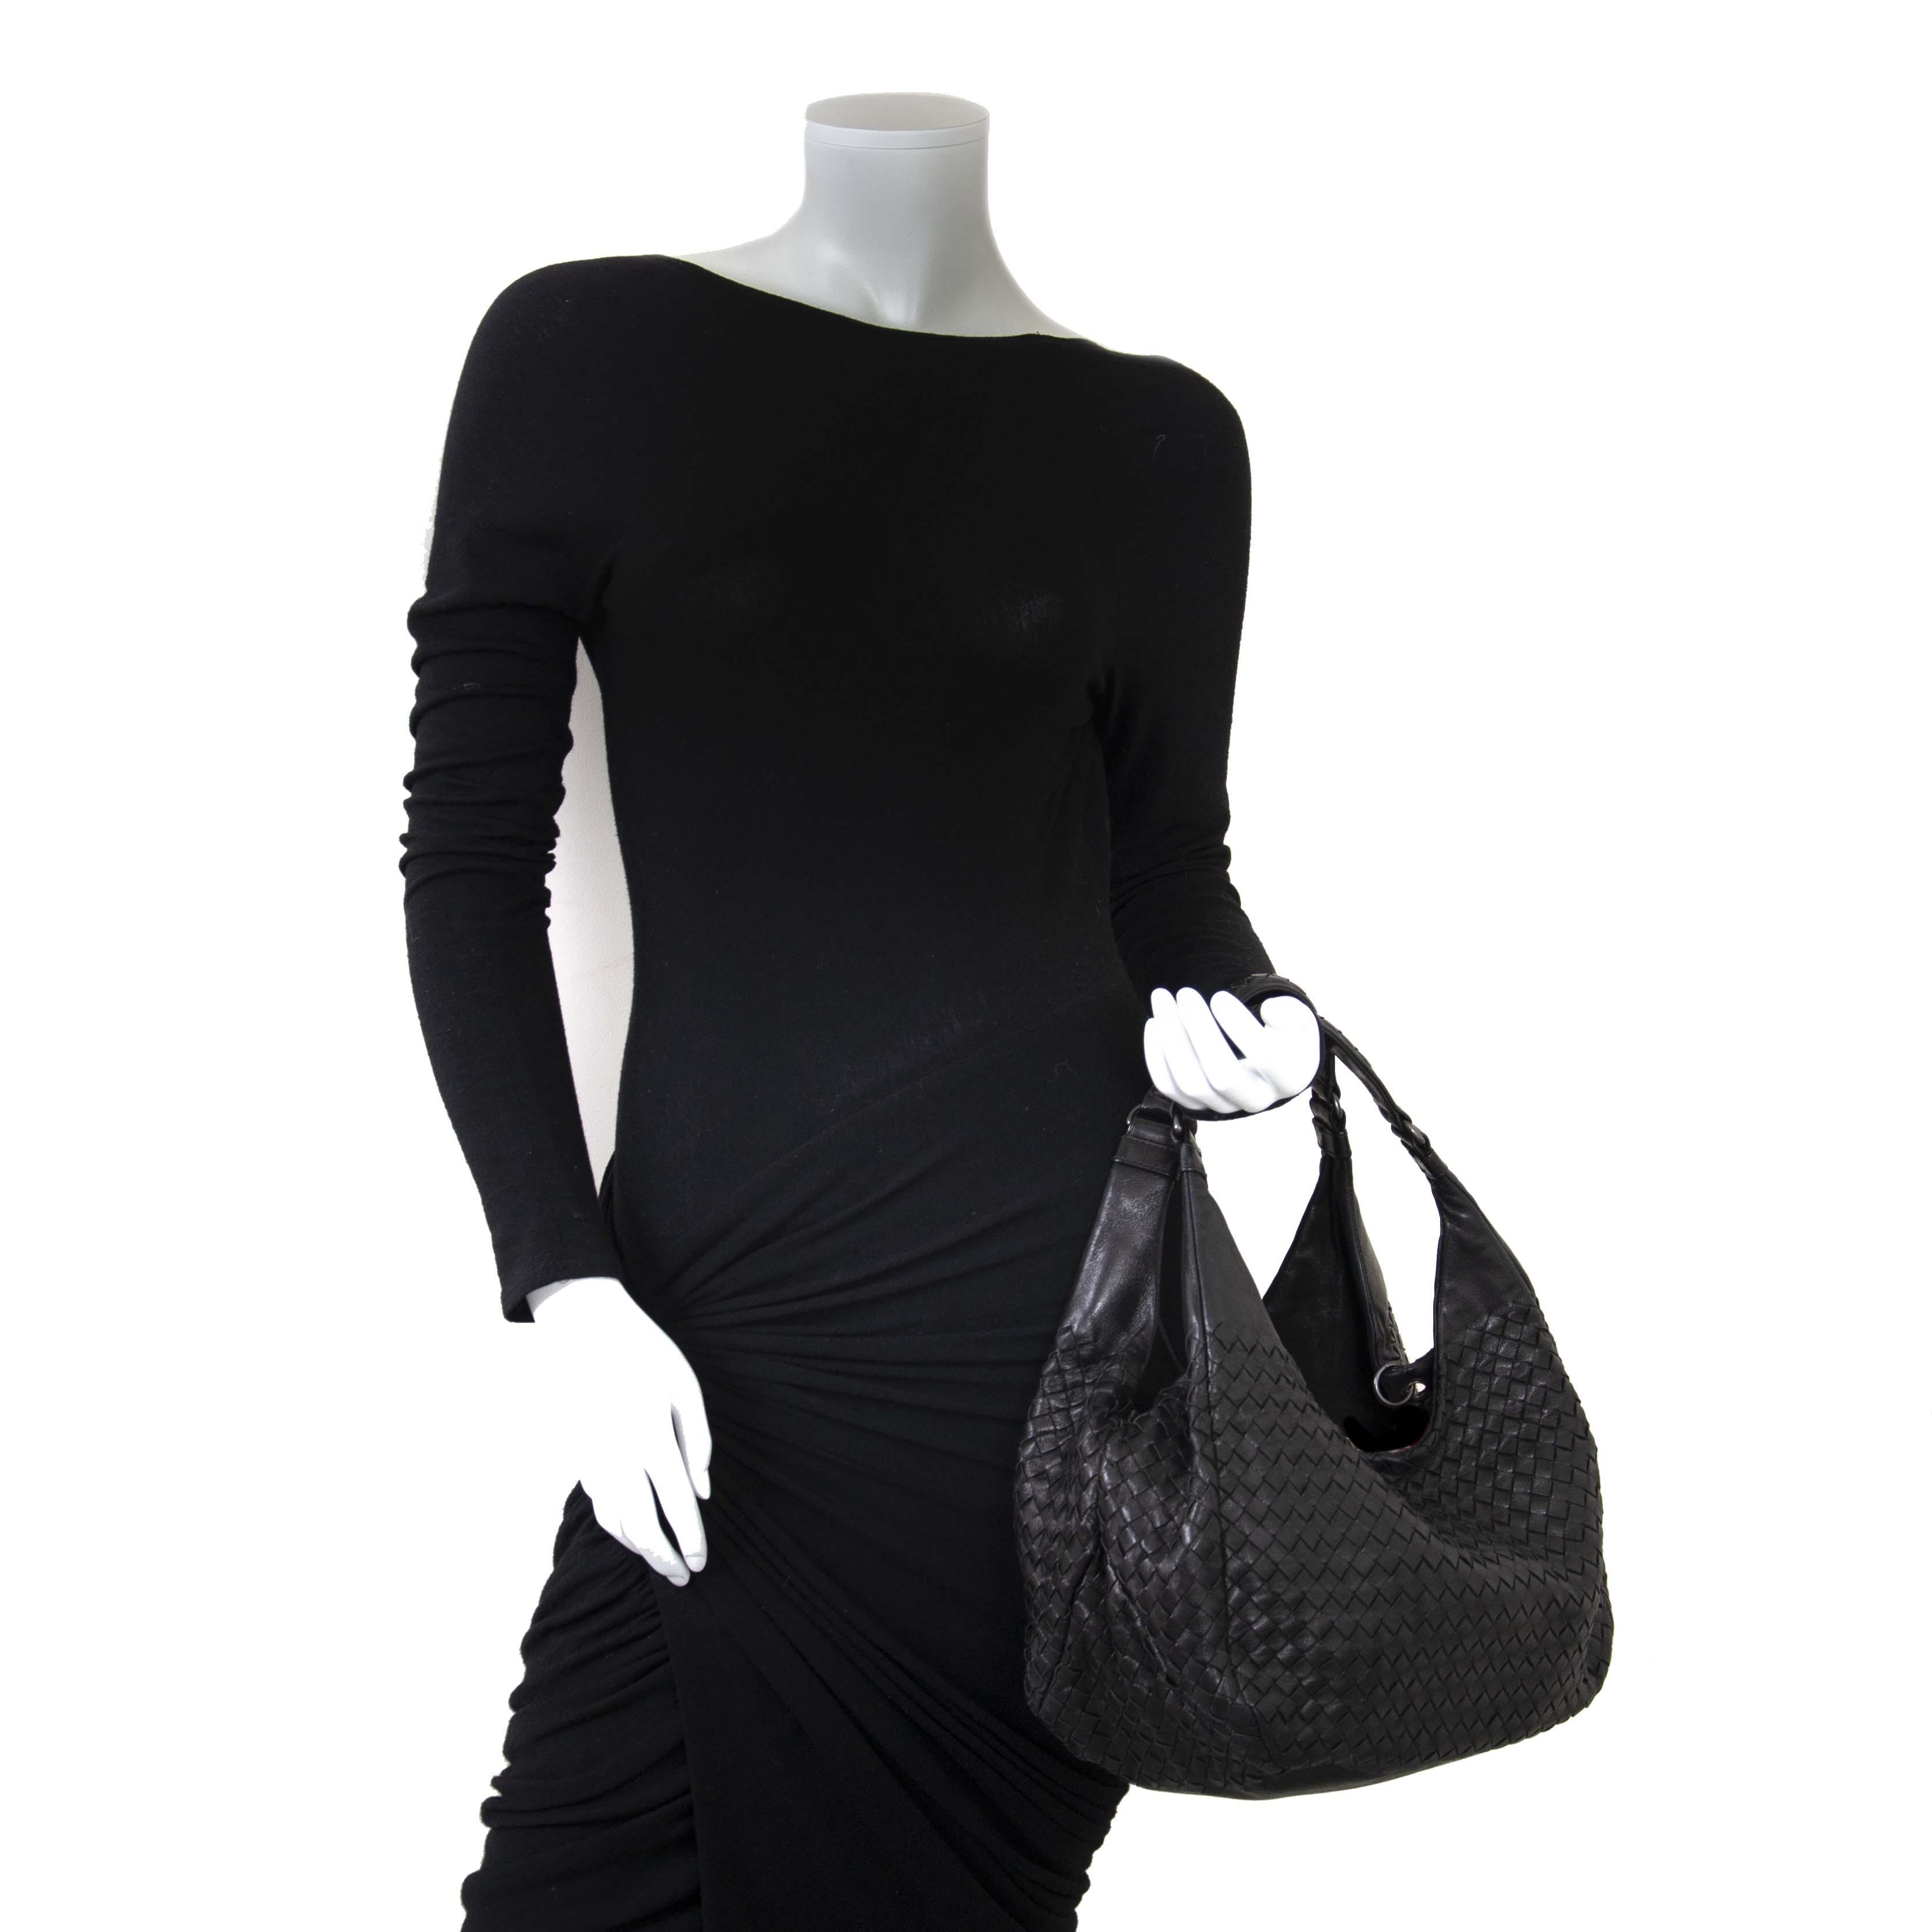 b984d5d1b2 ... Bottega Veneta Black Intrecciato Nappa Shoulder Bag now for sale at labellov  vintage fashion webshop belgium